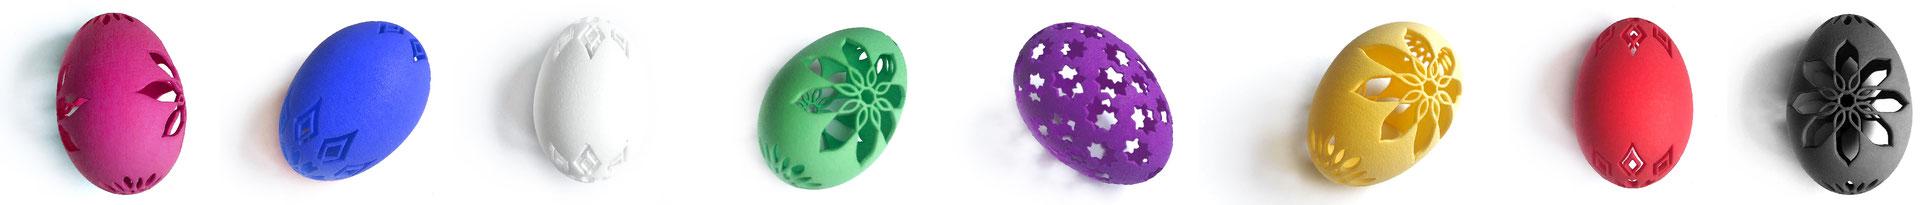 Nobahar-Design-Milano-Design Objests-Fertility-eggs-3dprinted